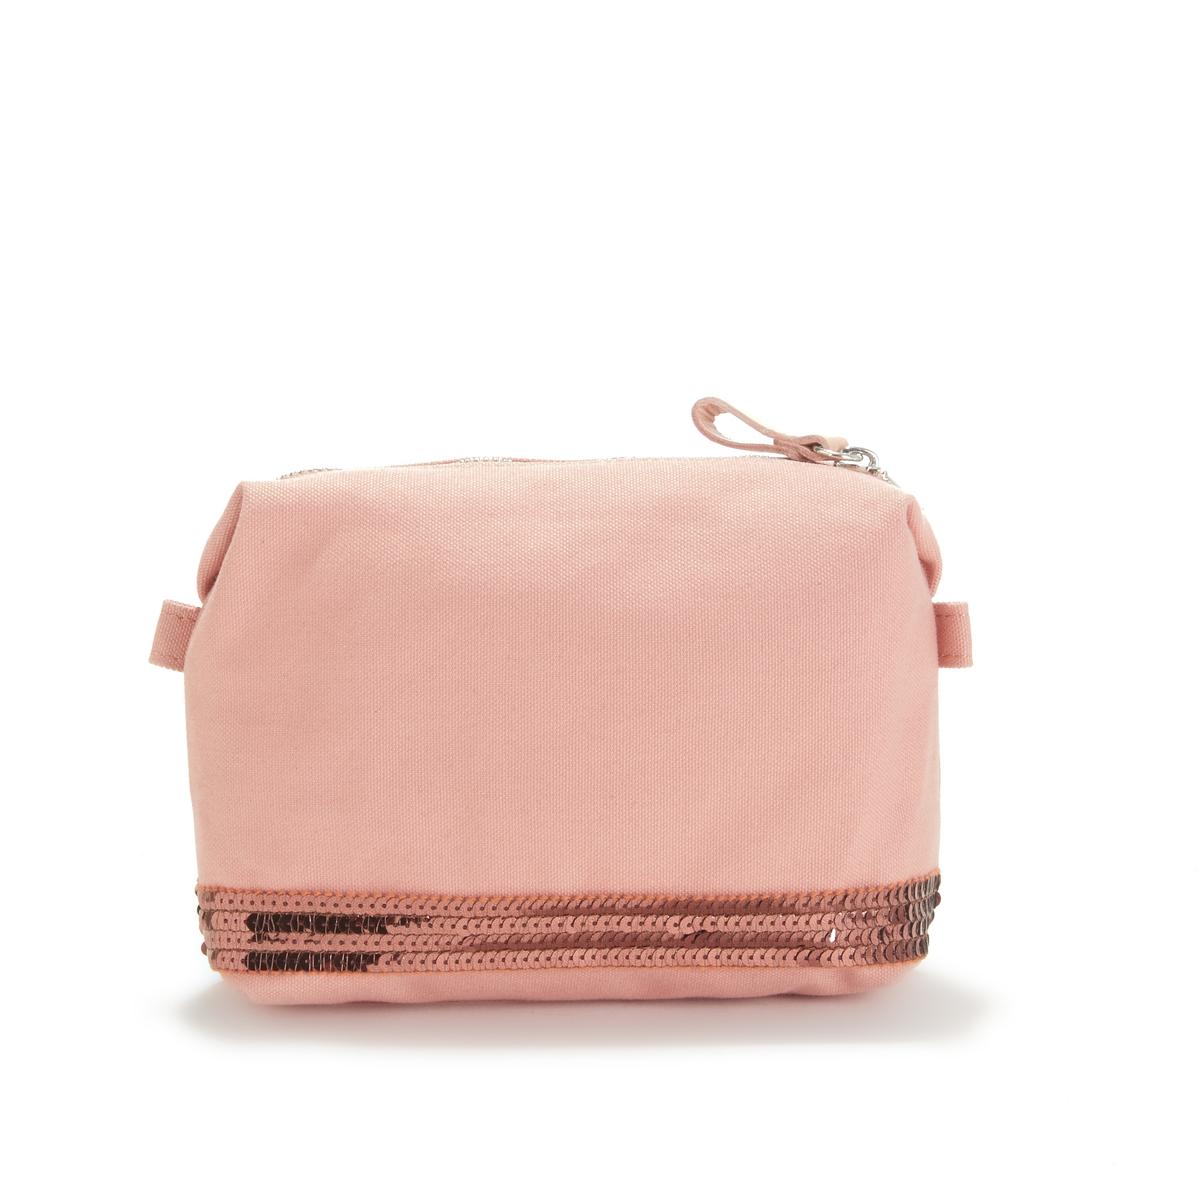 Сумка-косметичка La Redoute Из ткани с блестками единый размер розовый сумка la redoute из ткани с блестками h единый размер черный